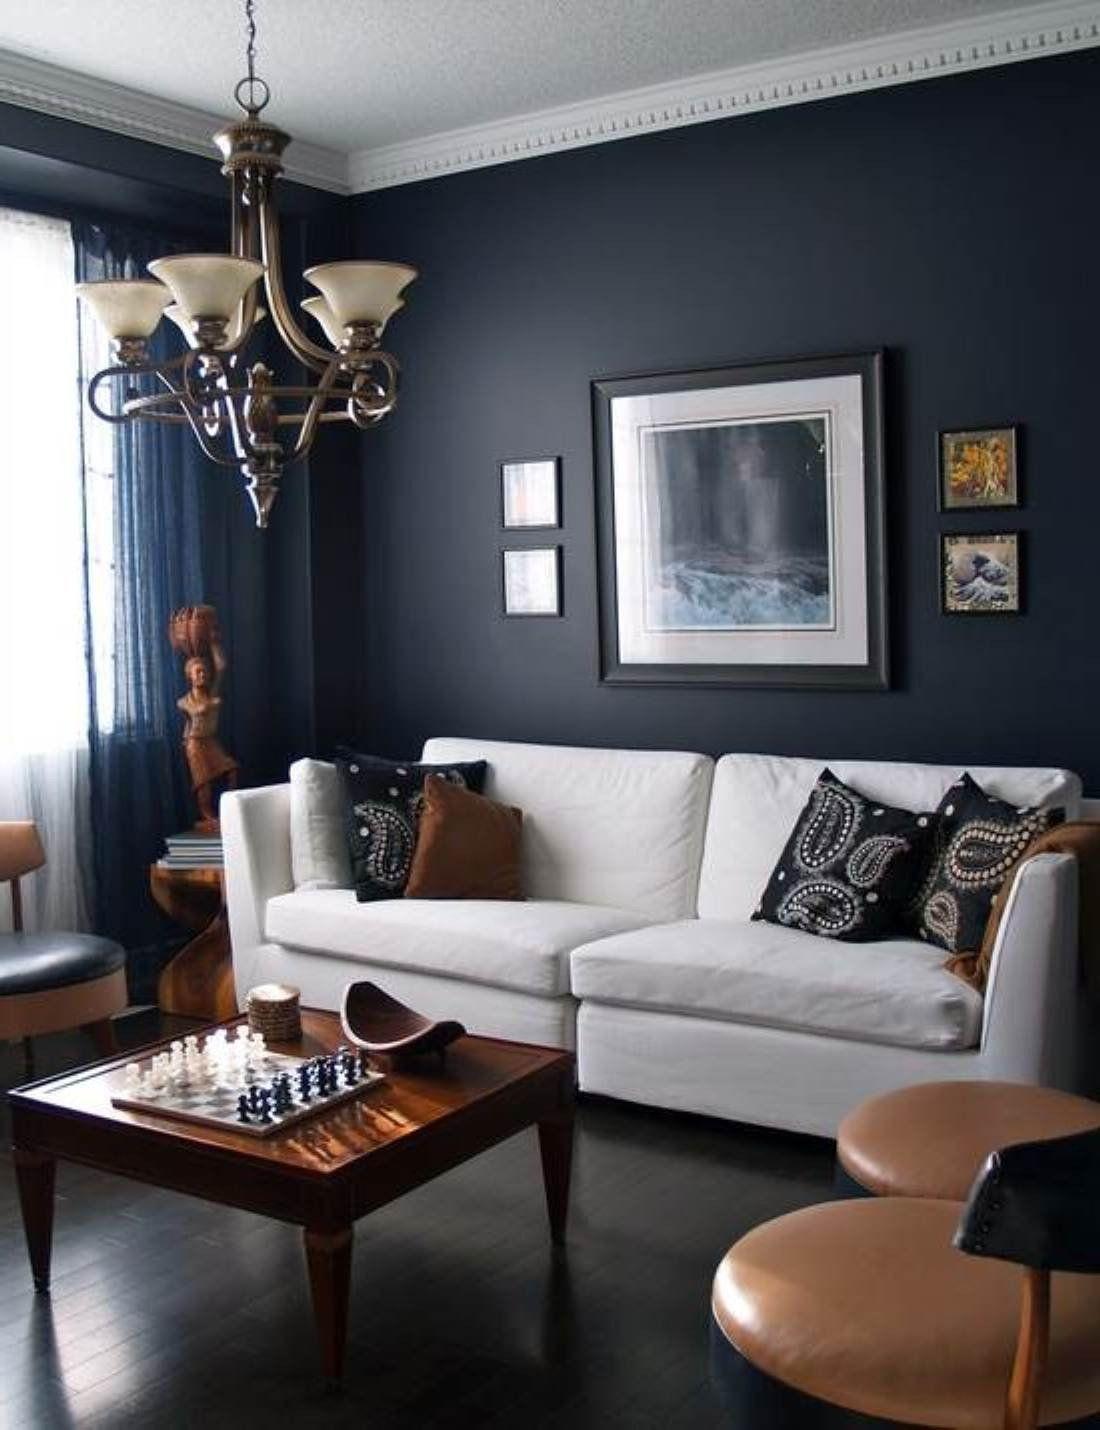 25 Best Small Living Room Decor And Design Ideas For 2020 Dokterandalan